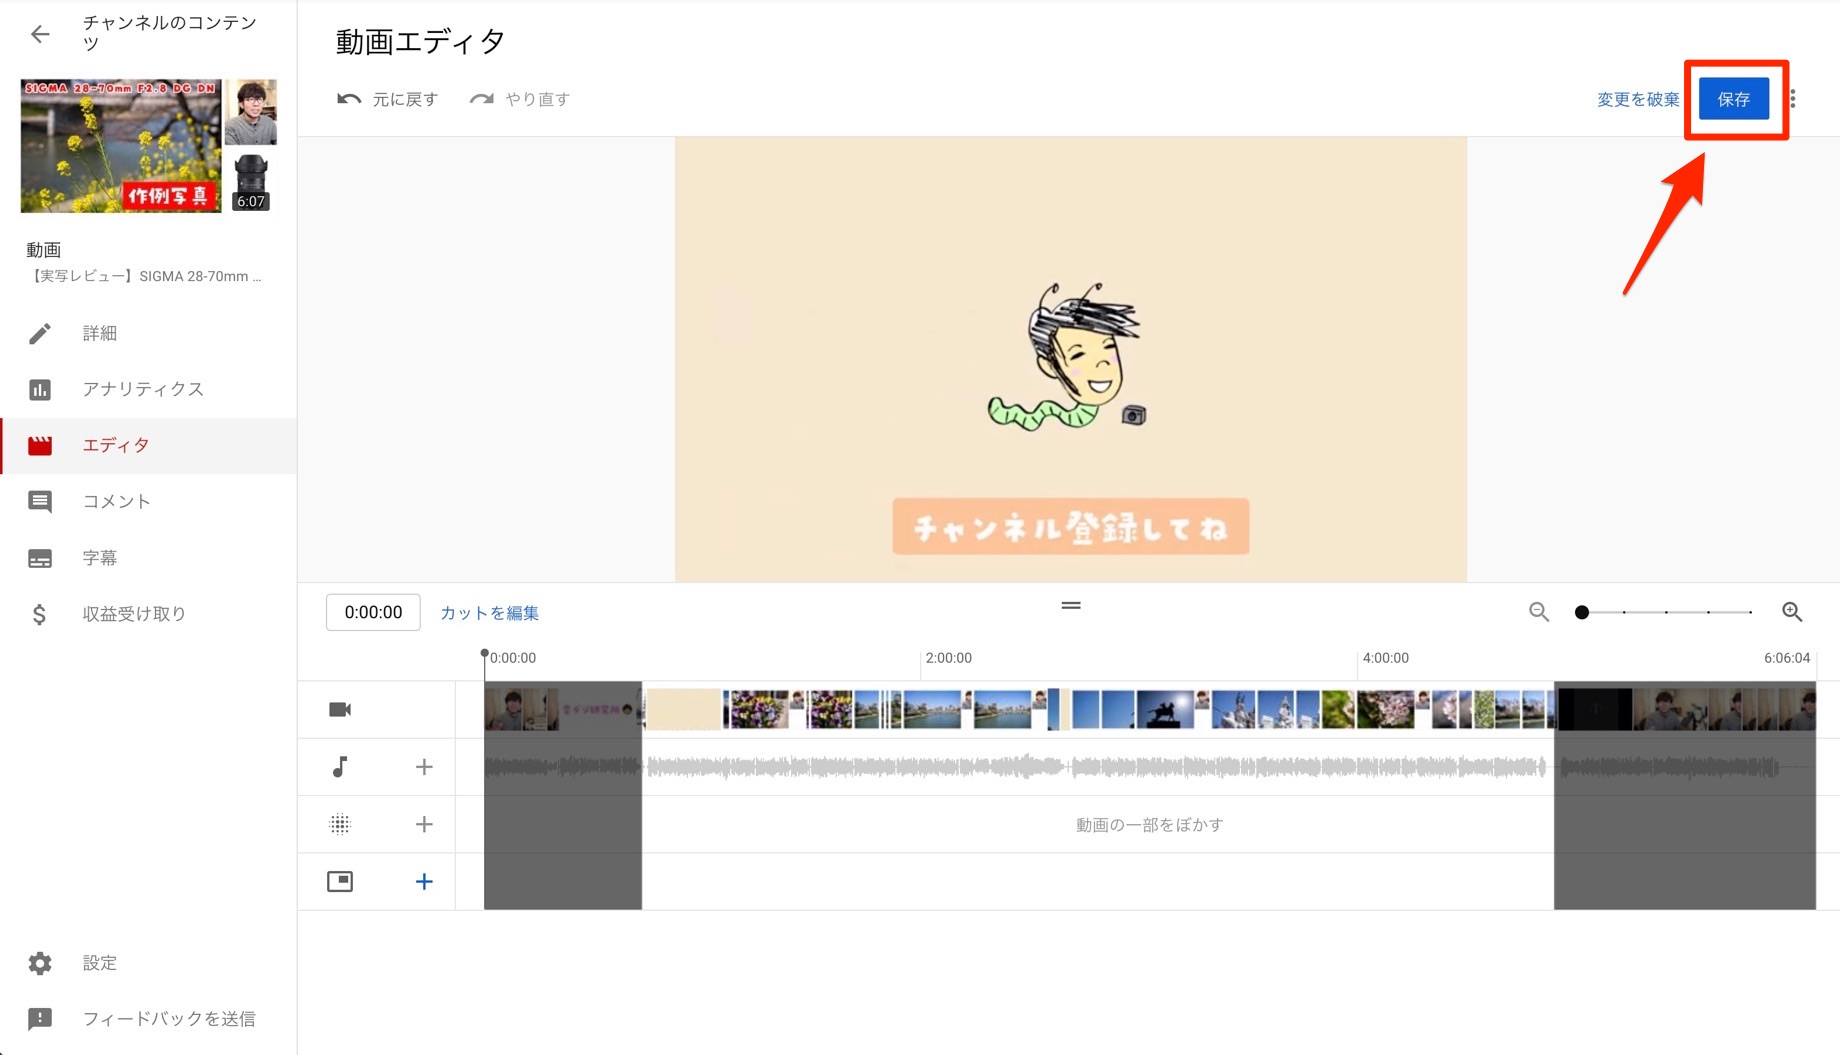 YouTube スタジオ カット 編集